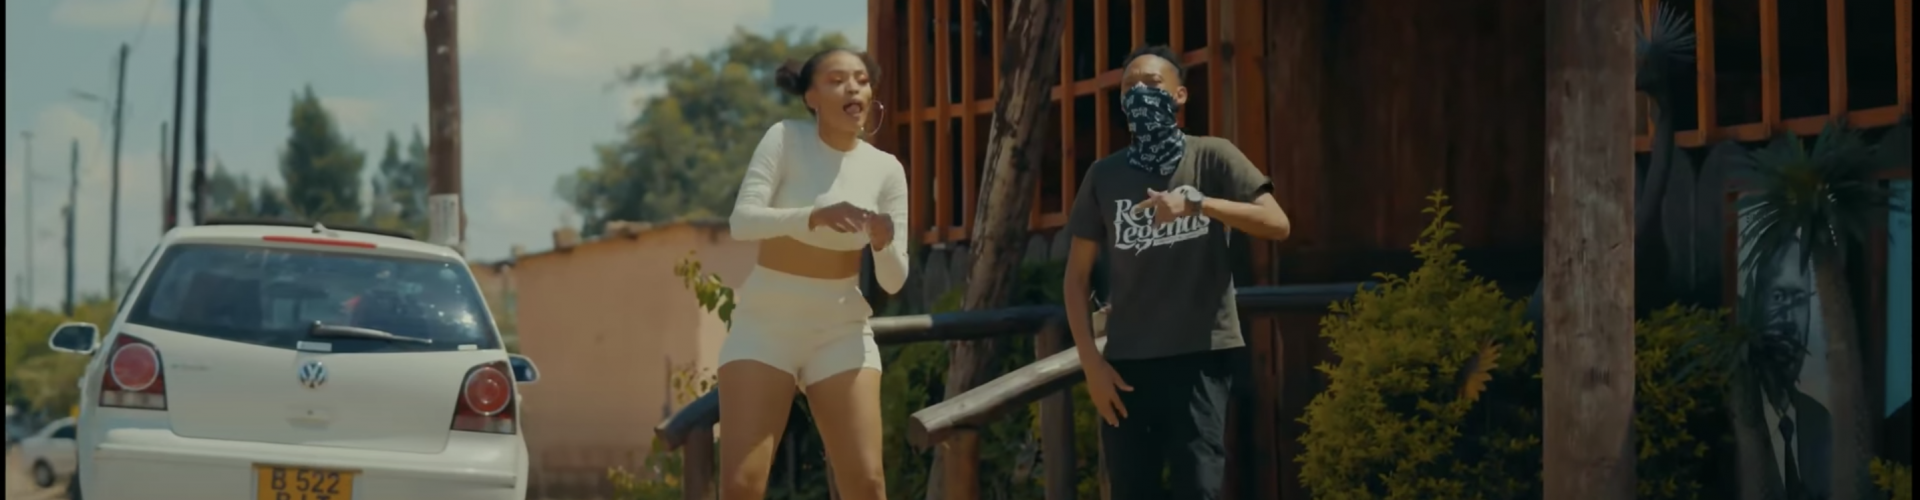 Jay Dot – HEAD BANGERZ ft. Scar, Gigi Lamayne & Sasa Klaas (Official Music Video)